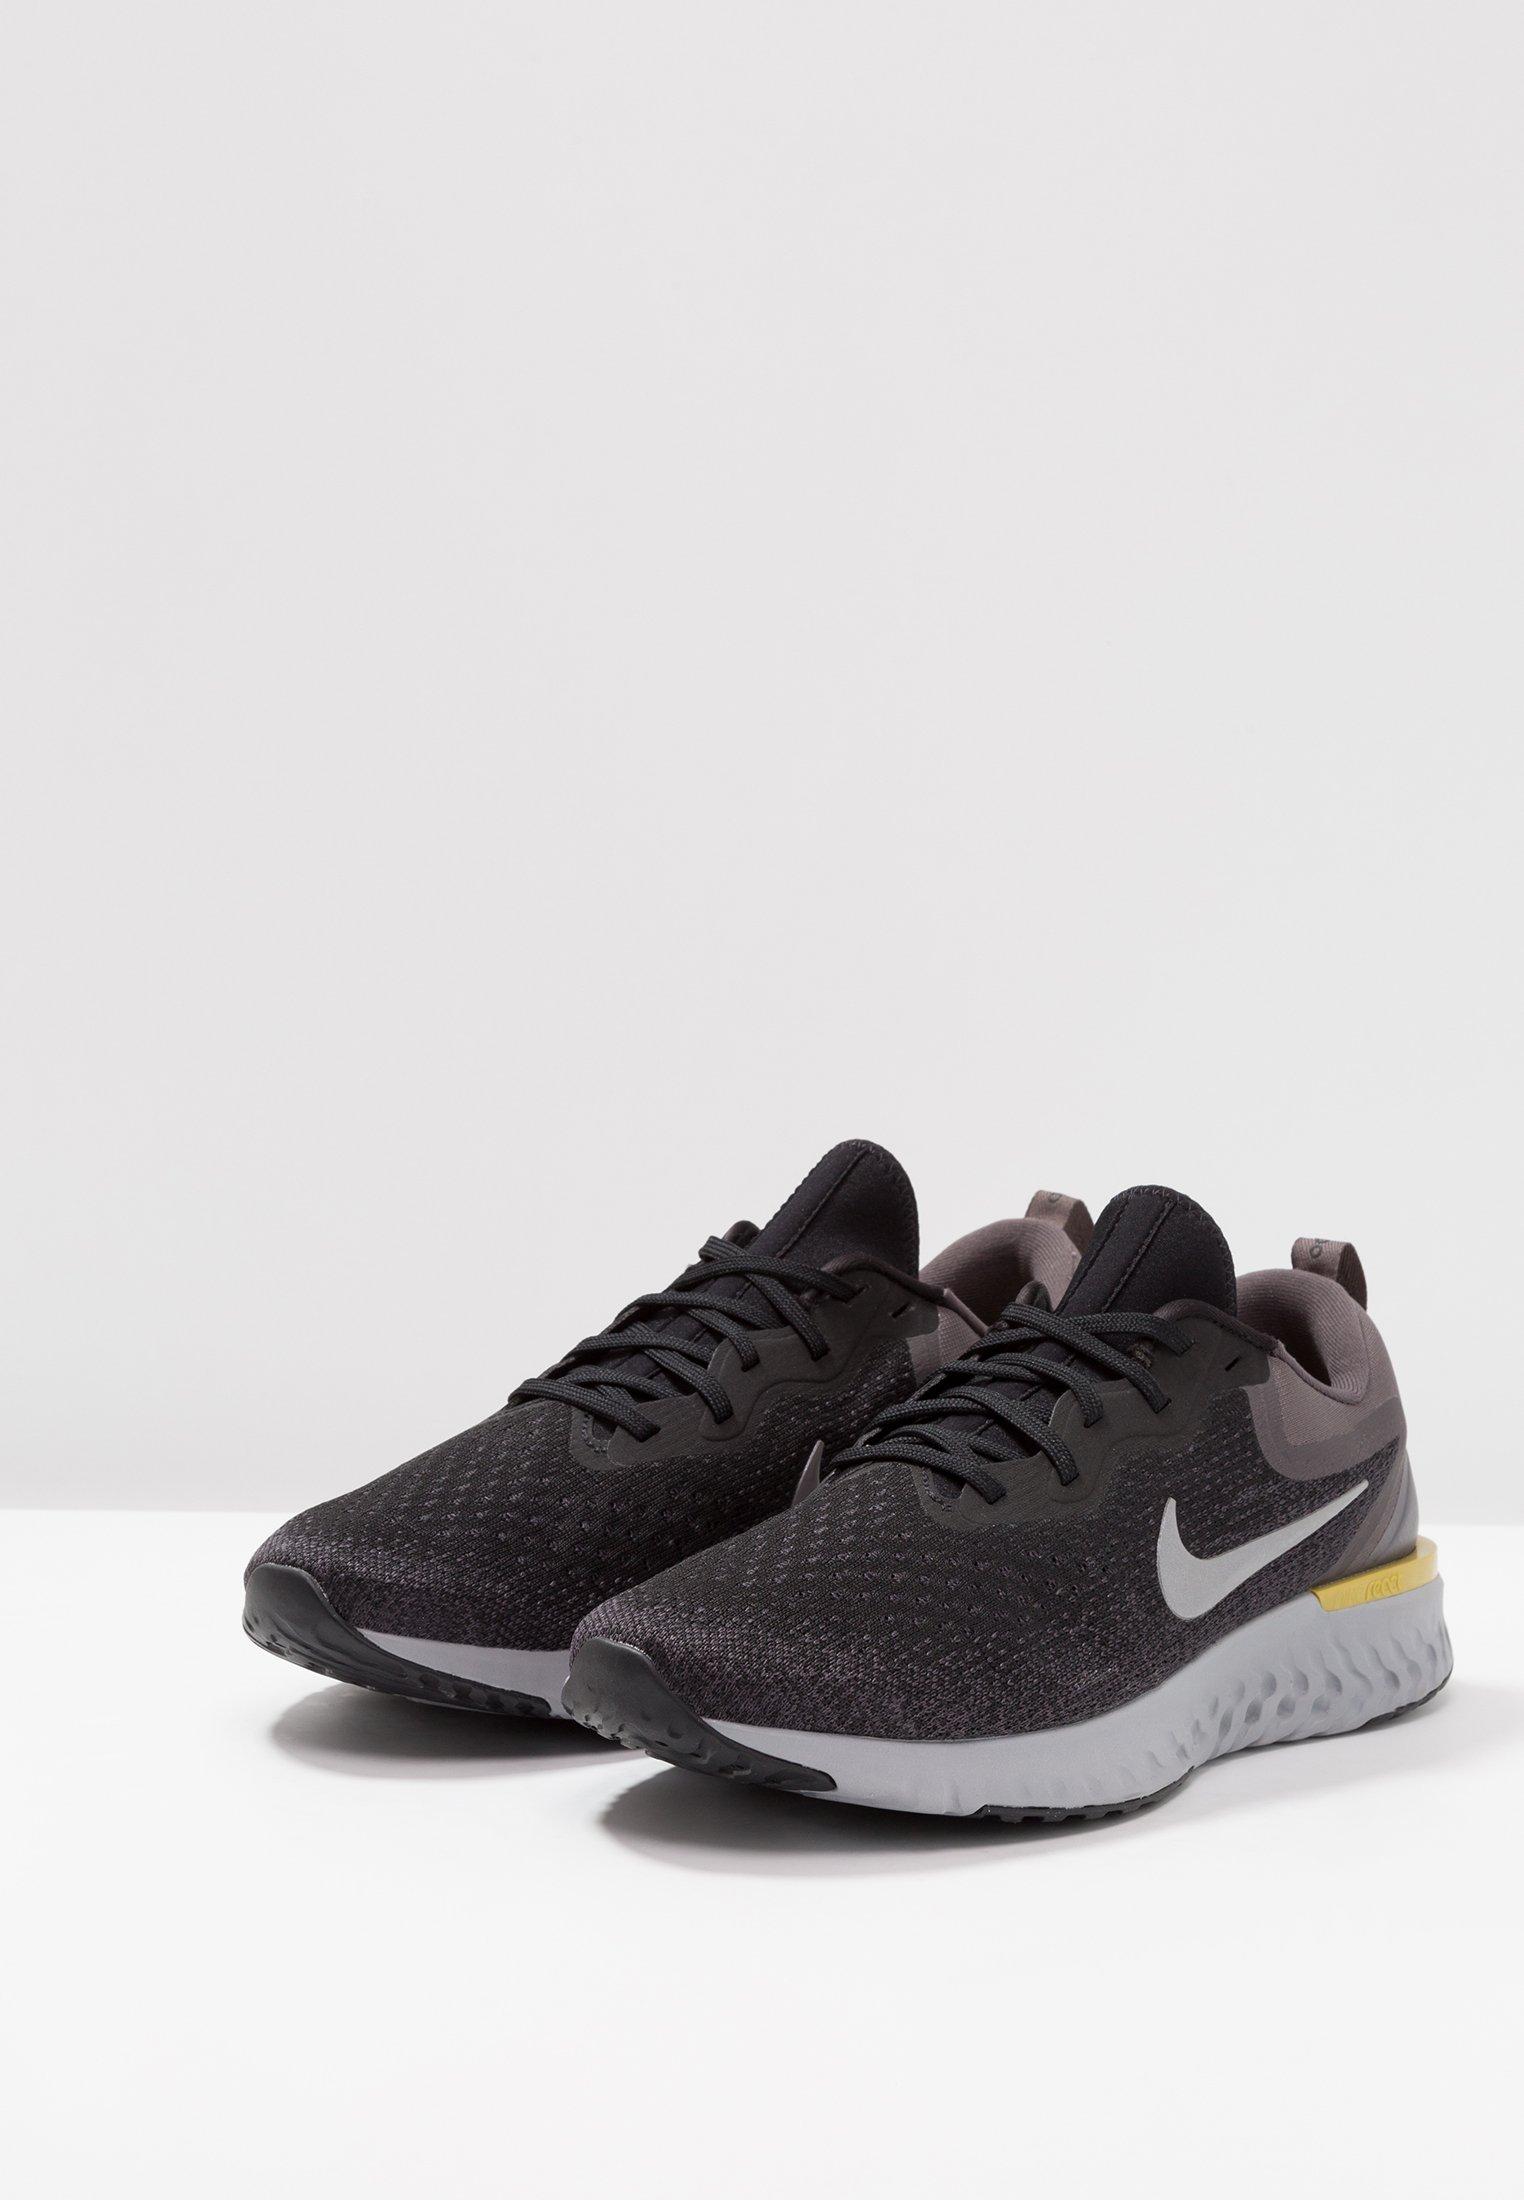 Grey thunder metallic Grey Odyssey Nike Black Performance De Neutres Moss atmosphere peat Running Pewter ReactChaussures tCrdxhsQ